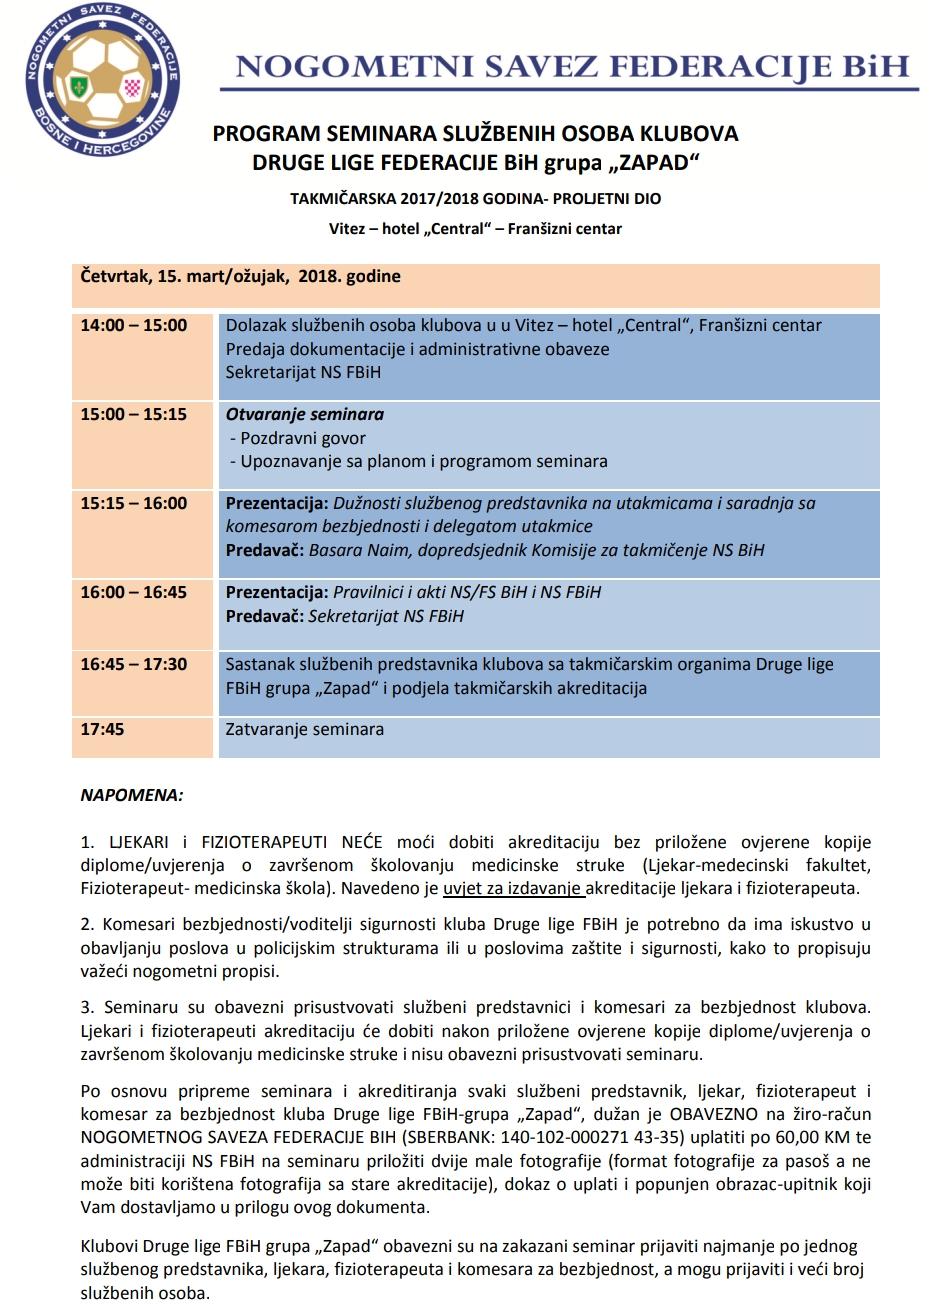 prog.seminara dr.liga 2018 (1)